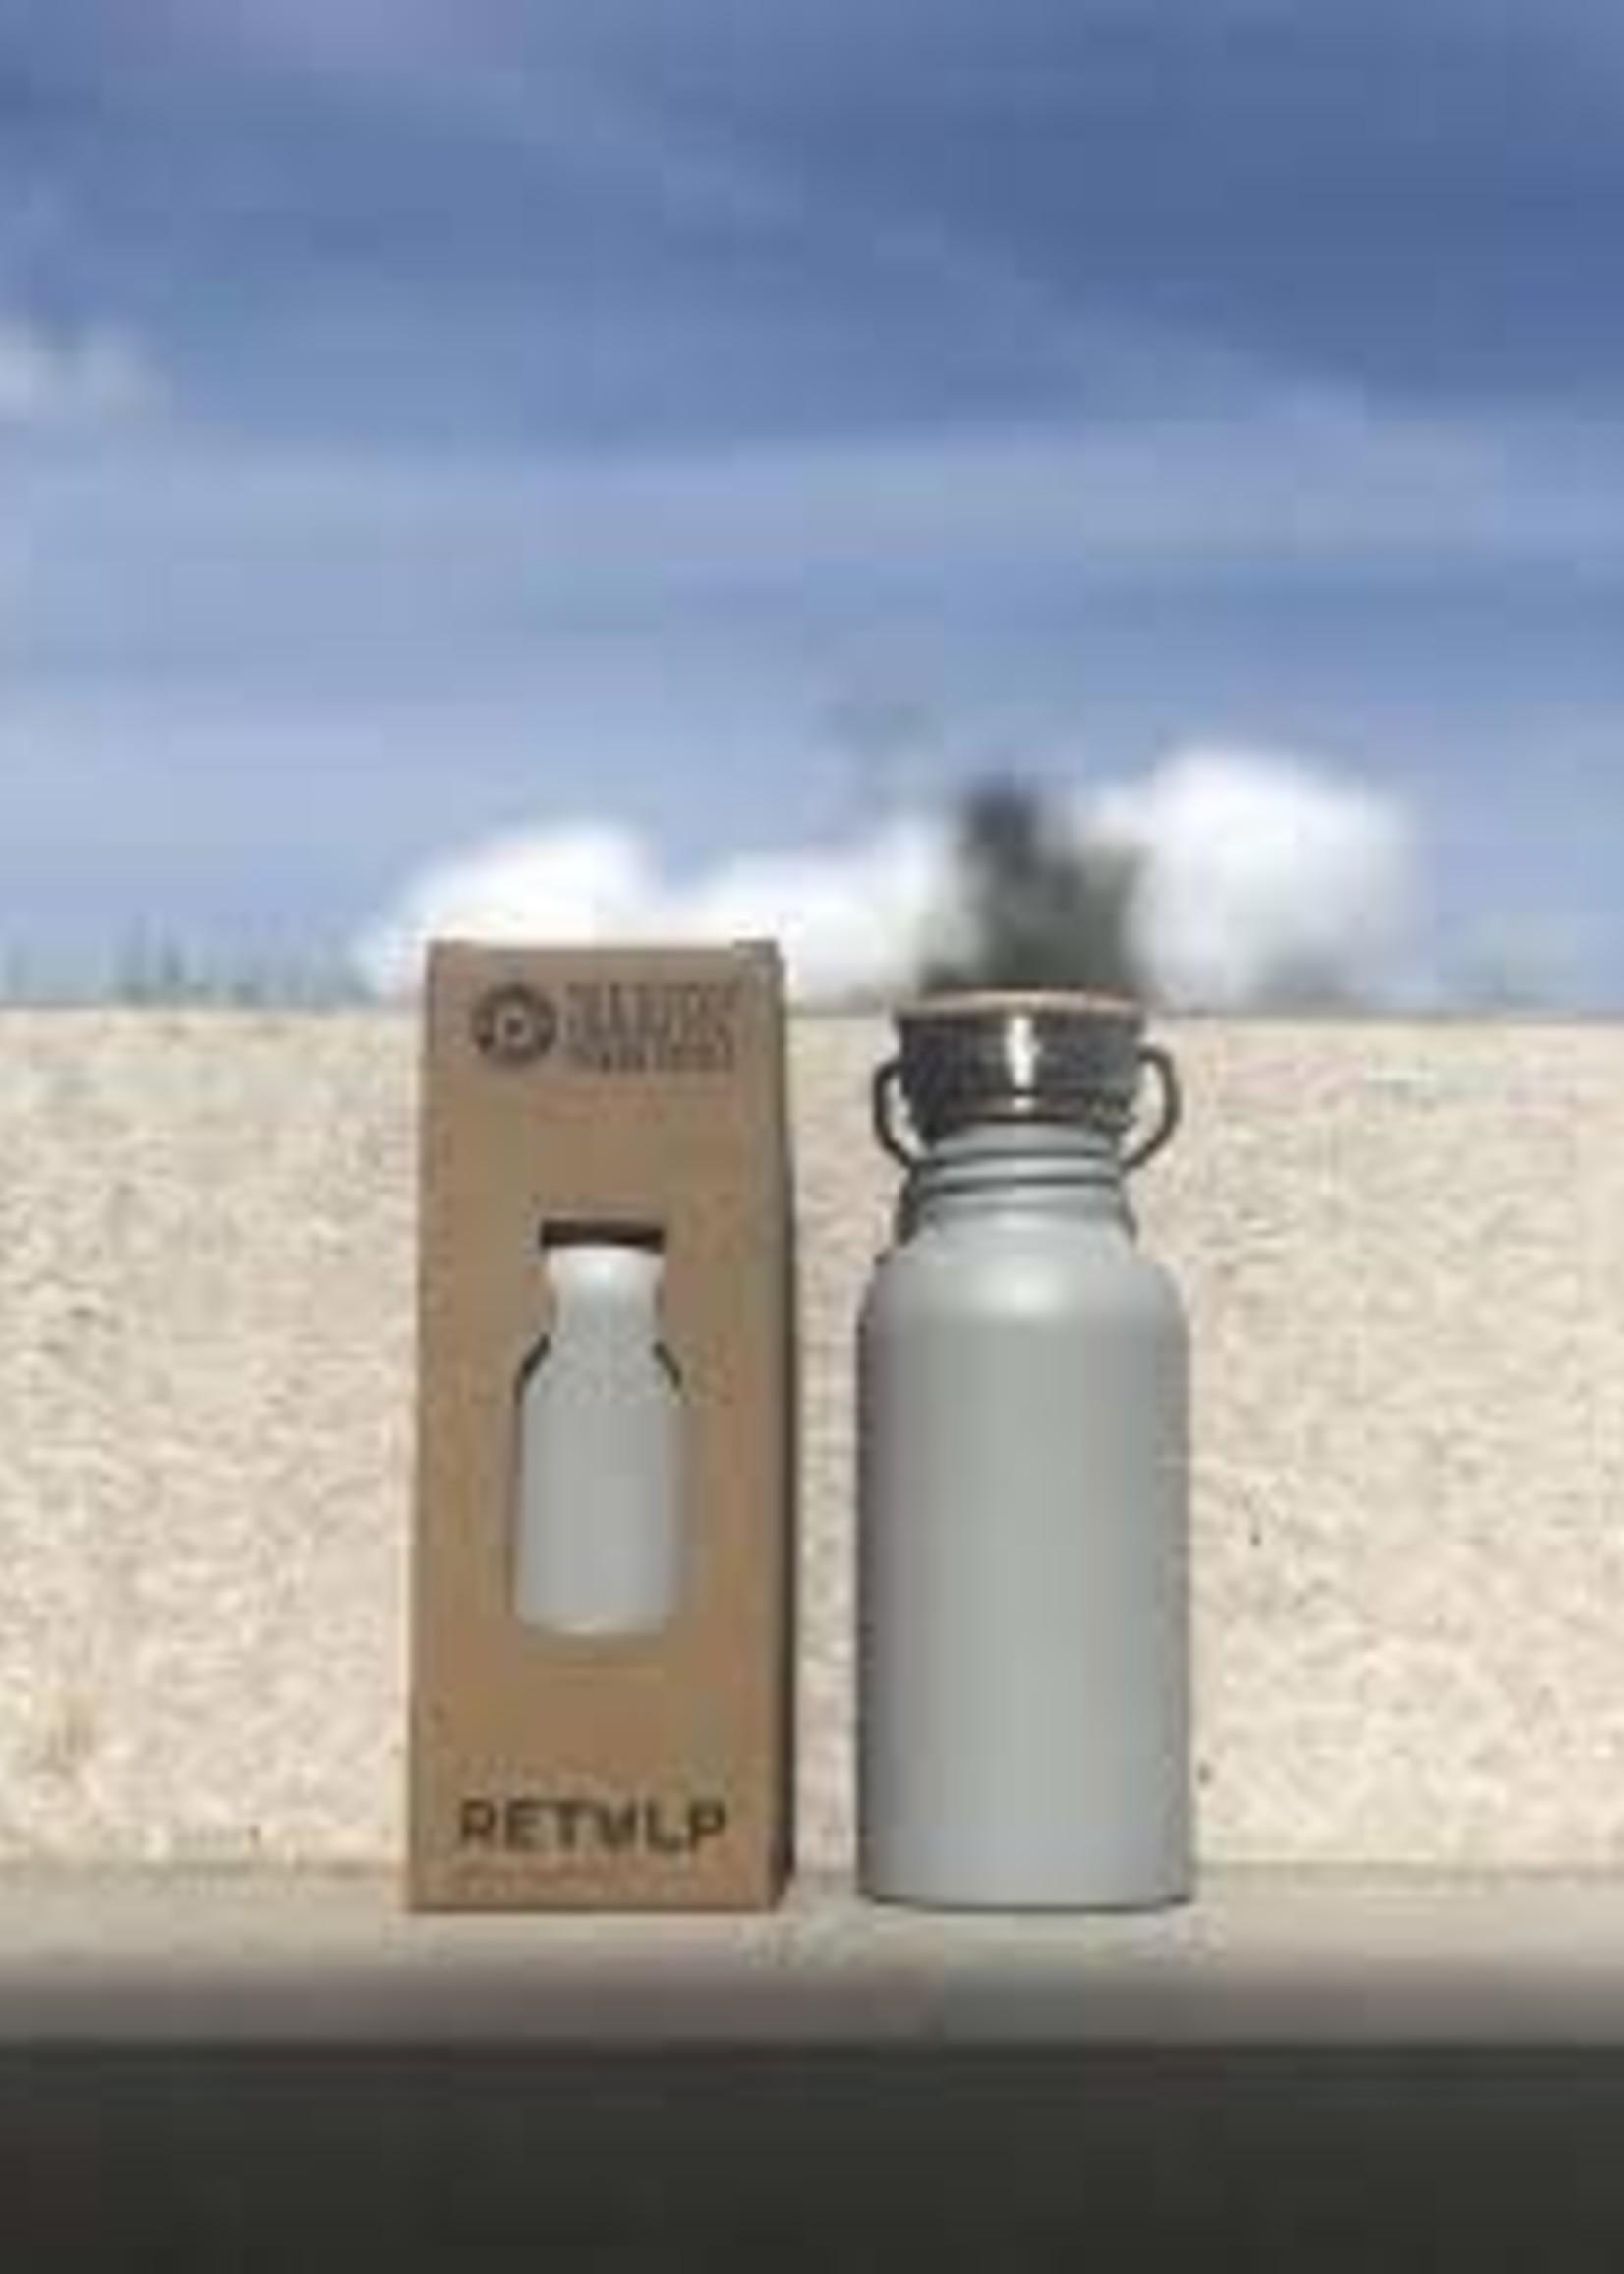 Retulp Retulp - Urban 500ml Grannies Grey